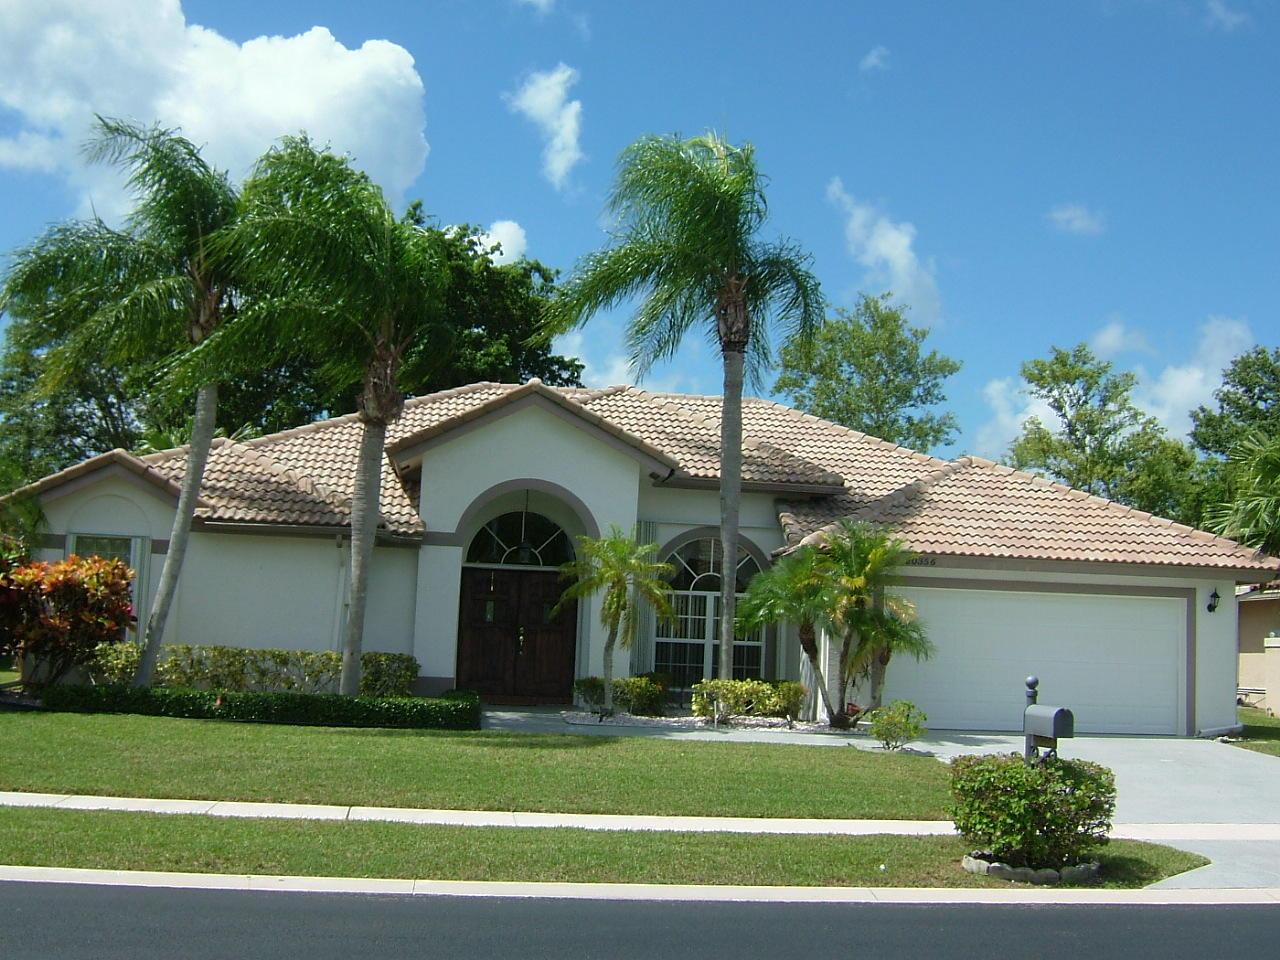 20356 Hacienda Court Boca Raton, FL 33498